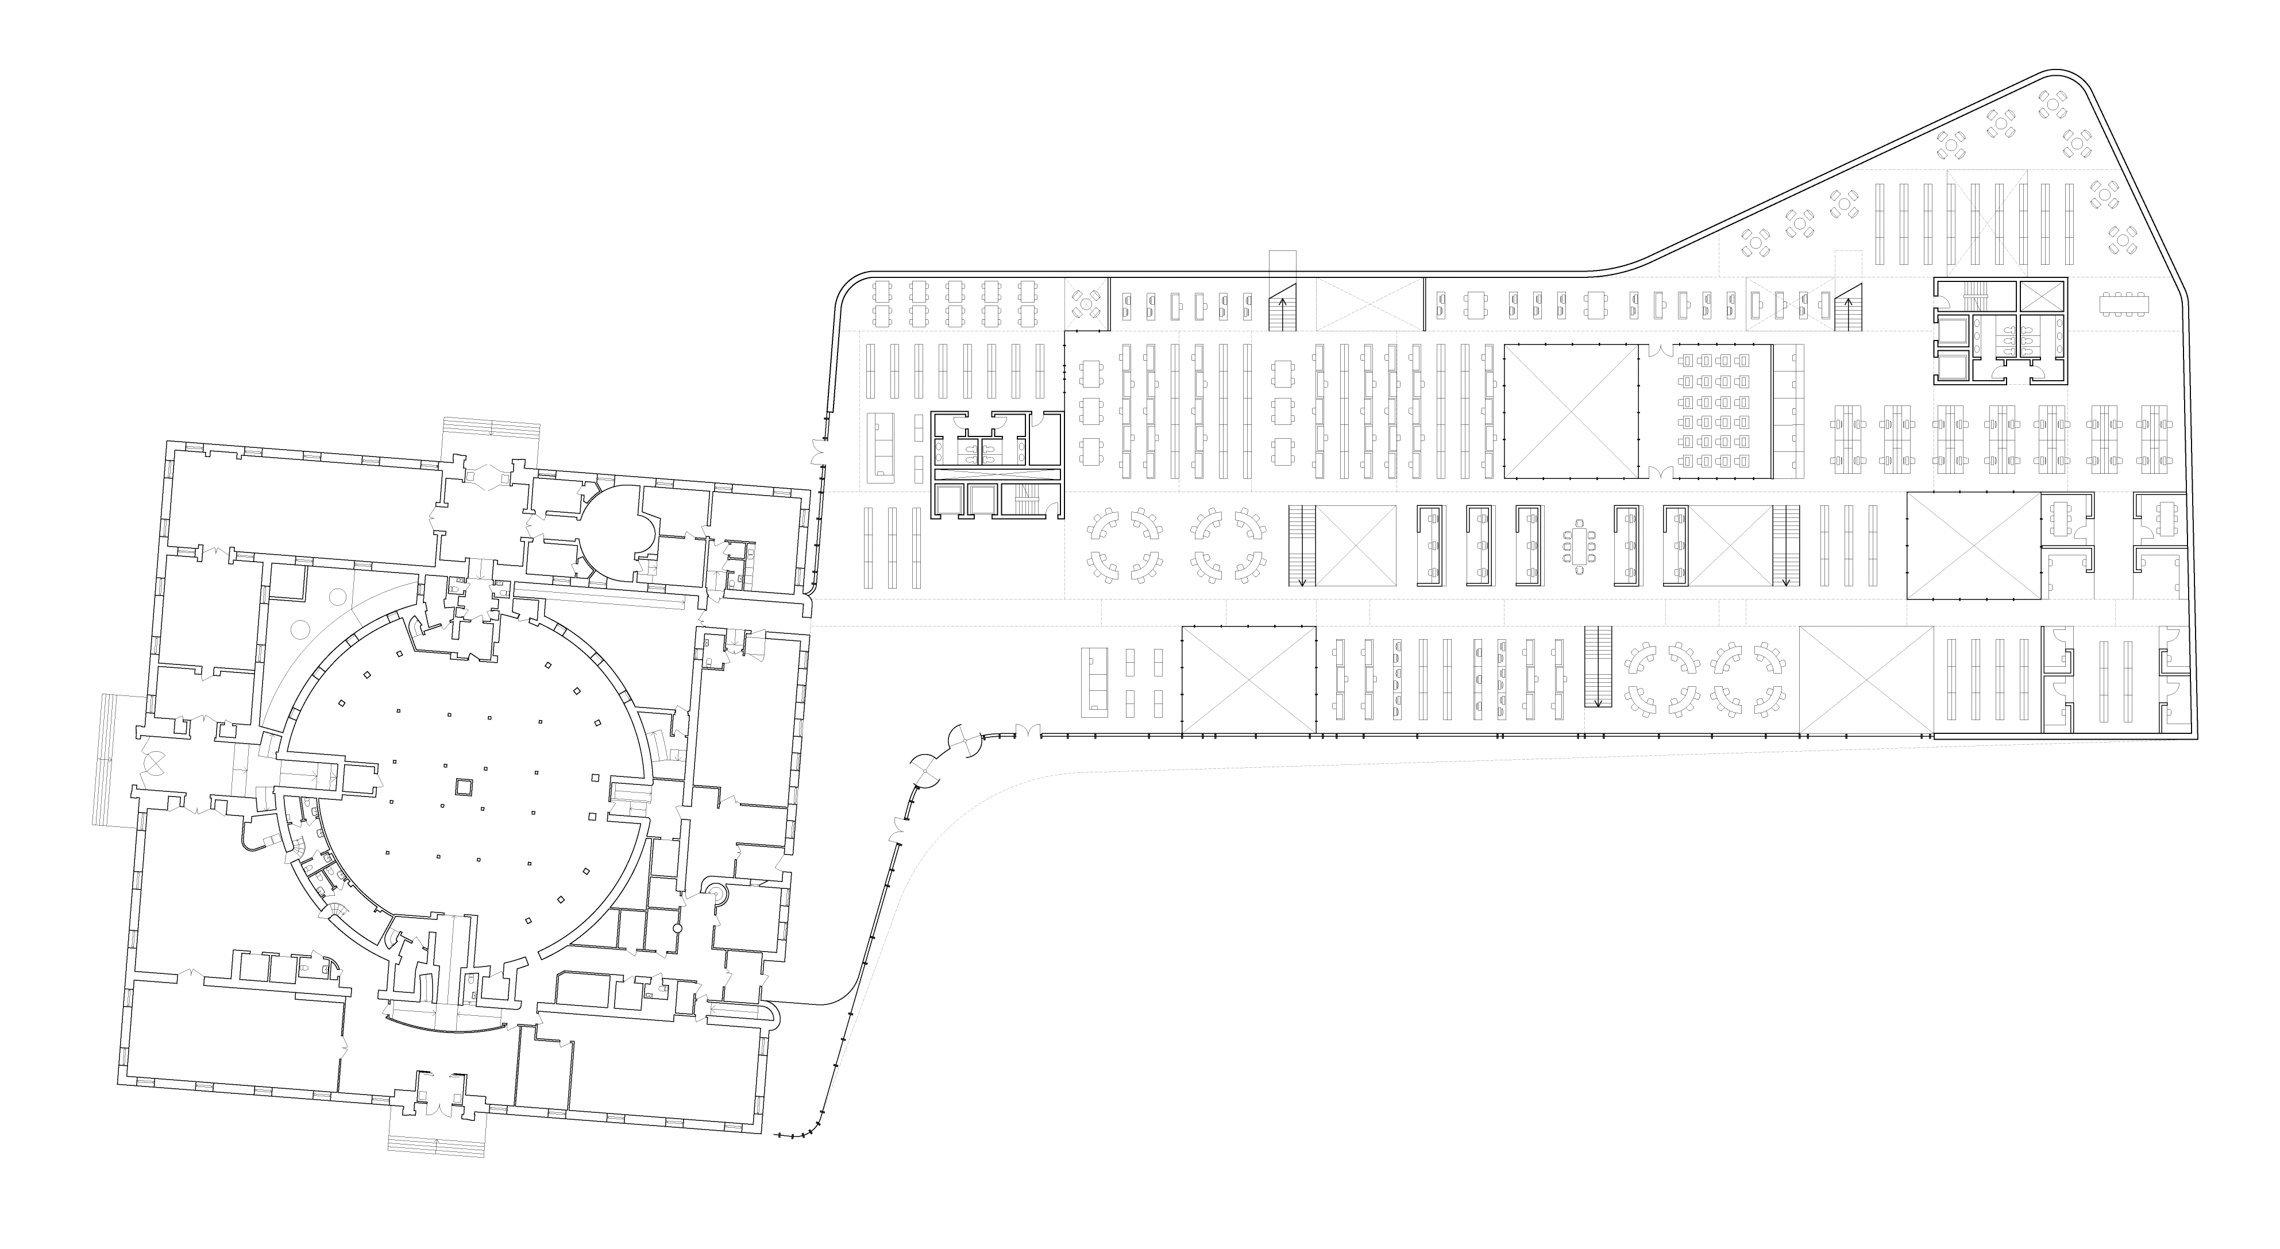 Auto Floor Plan Lending Floor Plan Lending 28 Images Floor Plan Lending 28